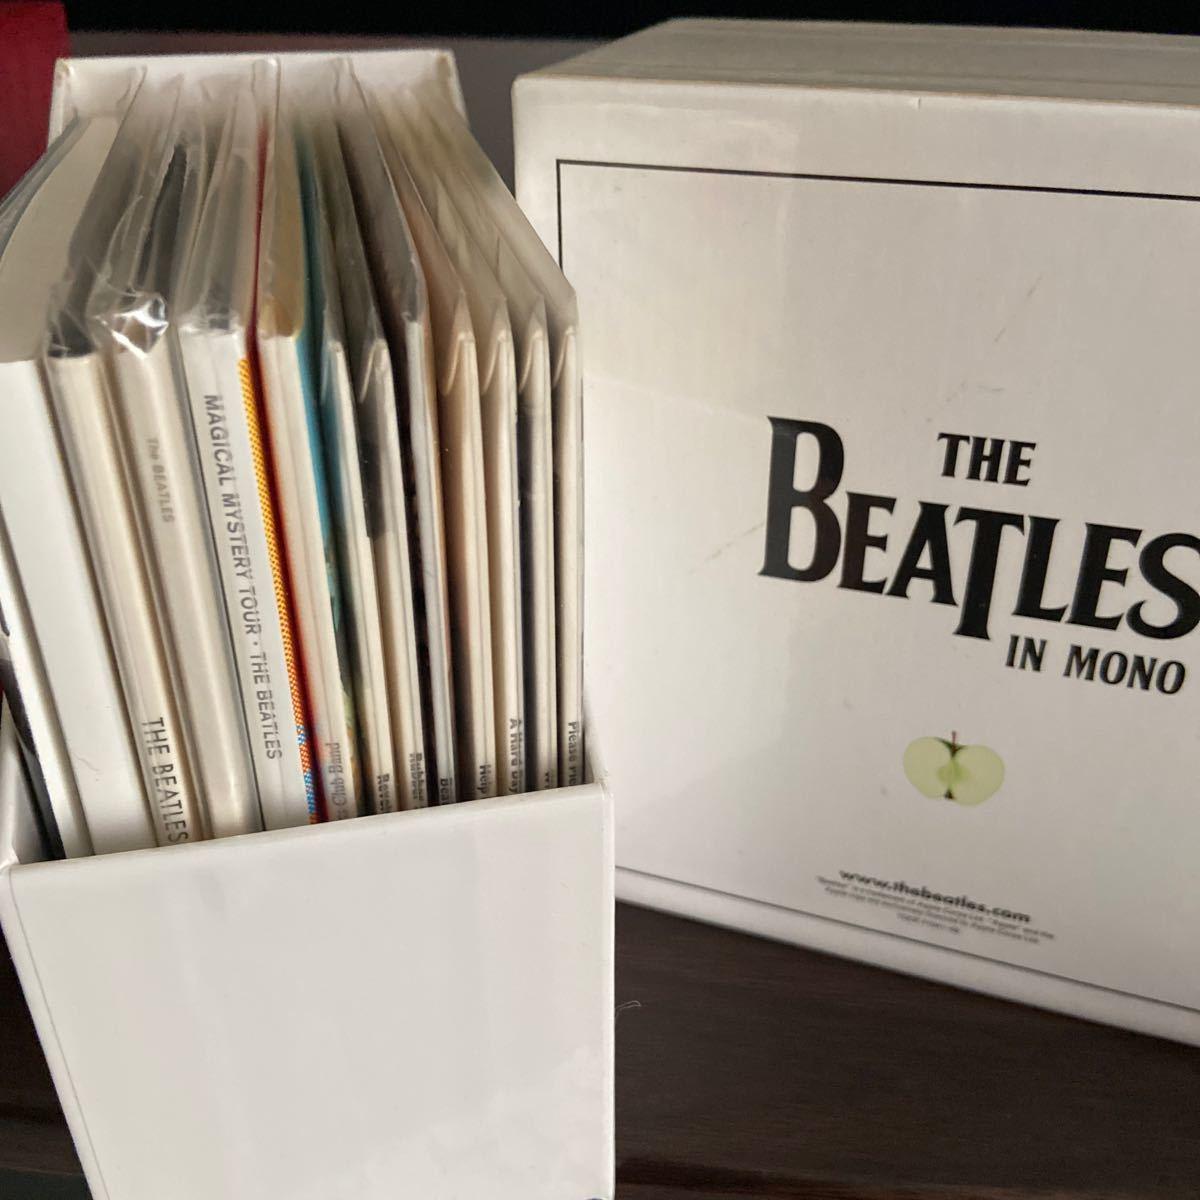 THE BEATLES ザ・ビートルズ MONO 初回生産限定盤